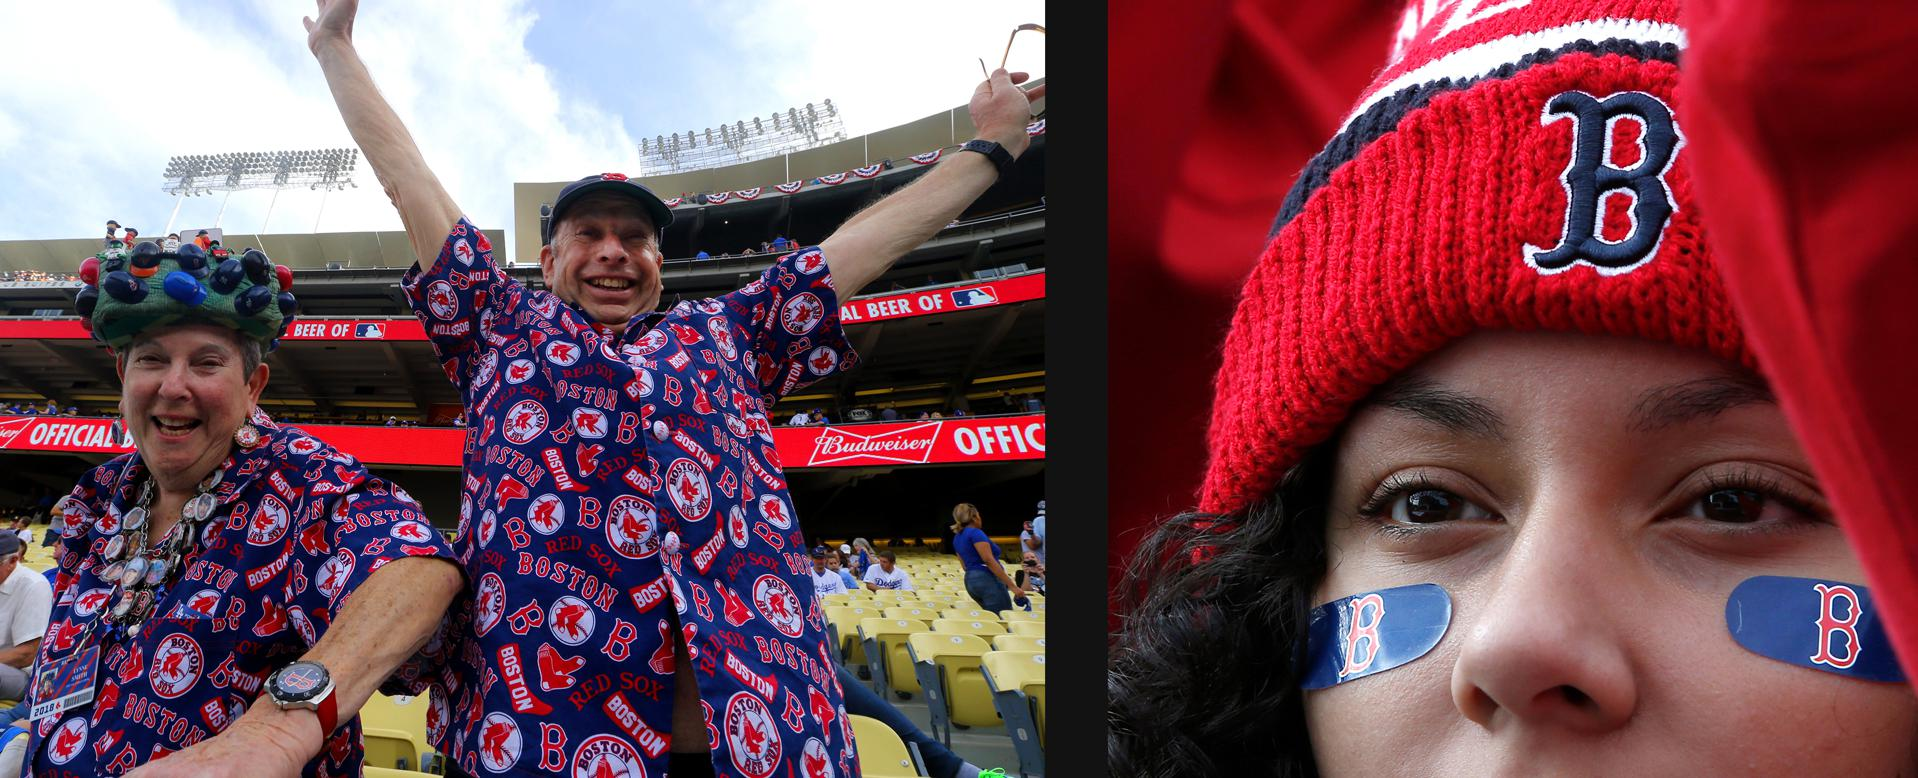 boston-red-sox-combo-by-jessica-rinaldi2-the-boston-globe-getty-images